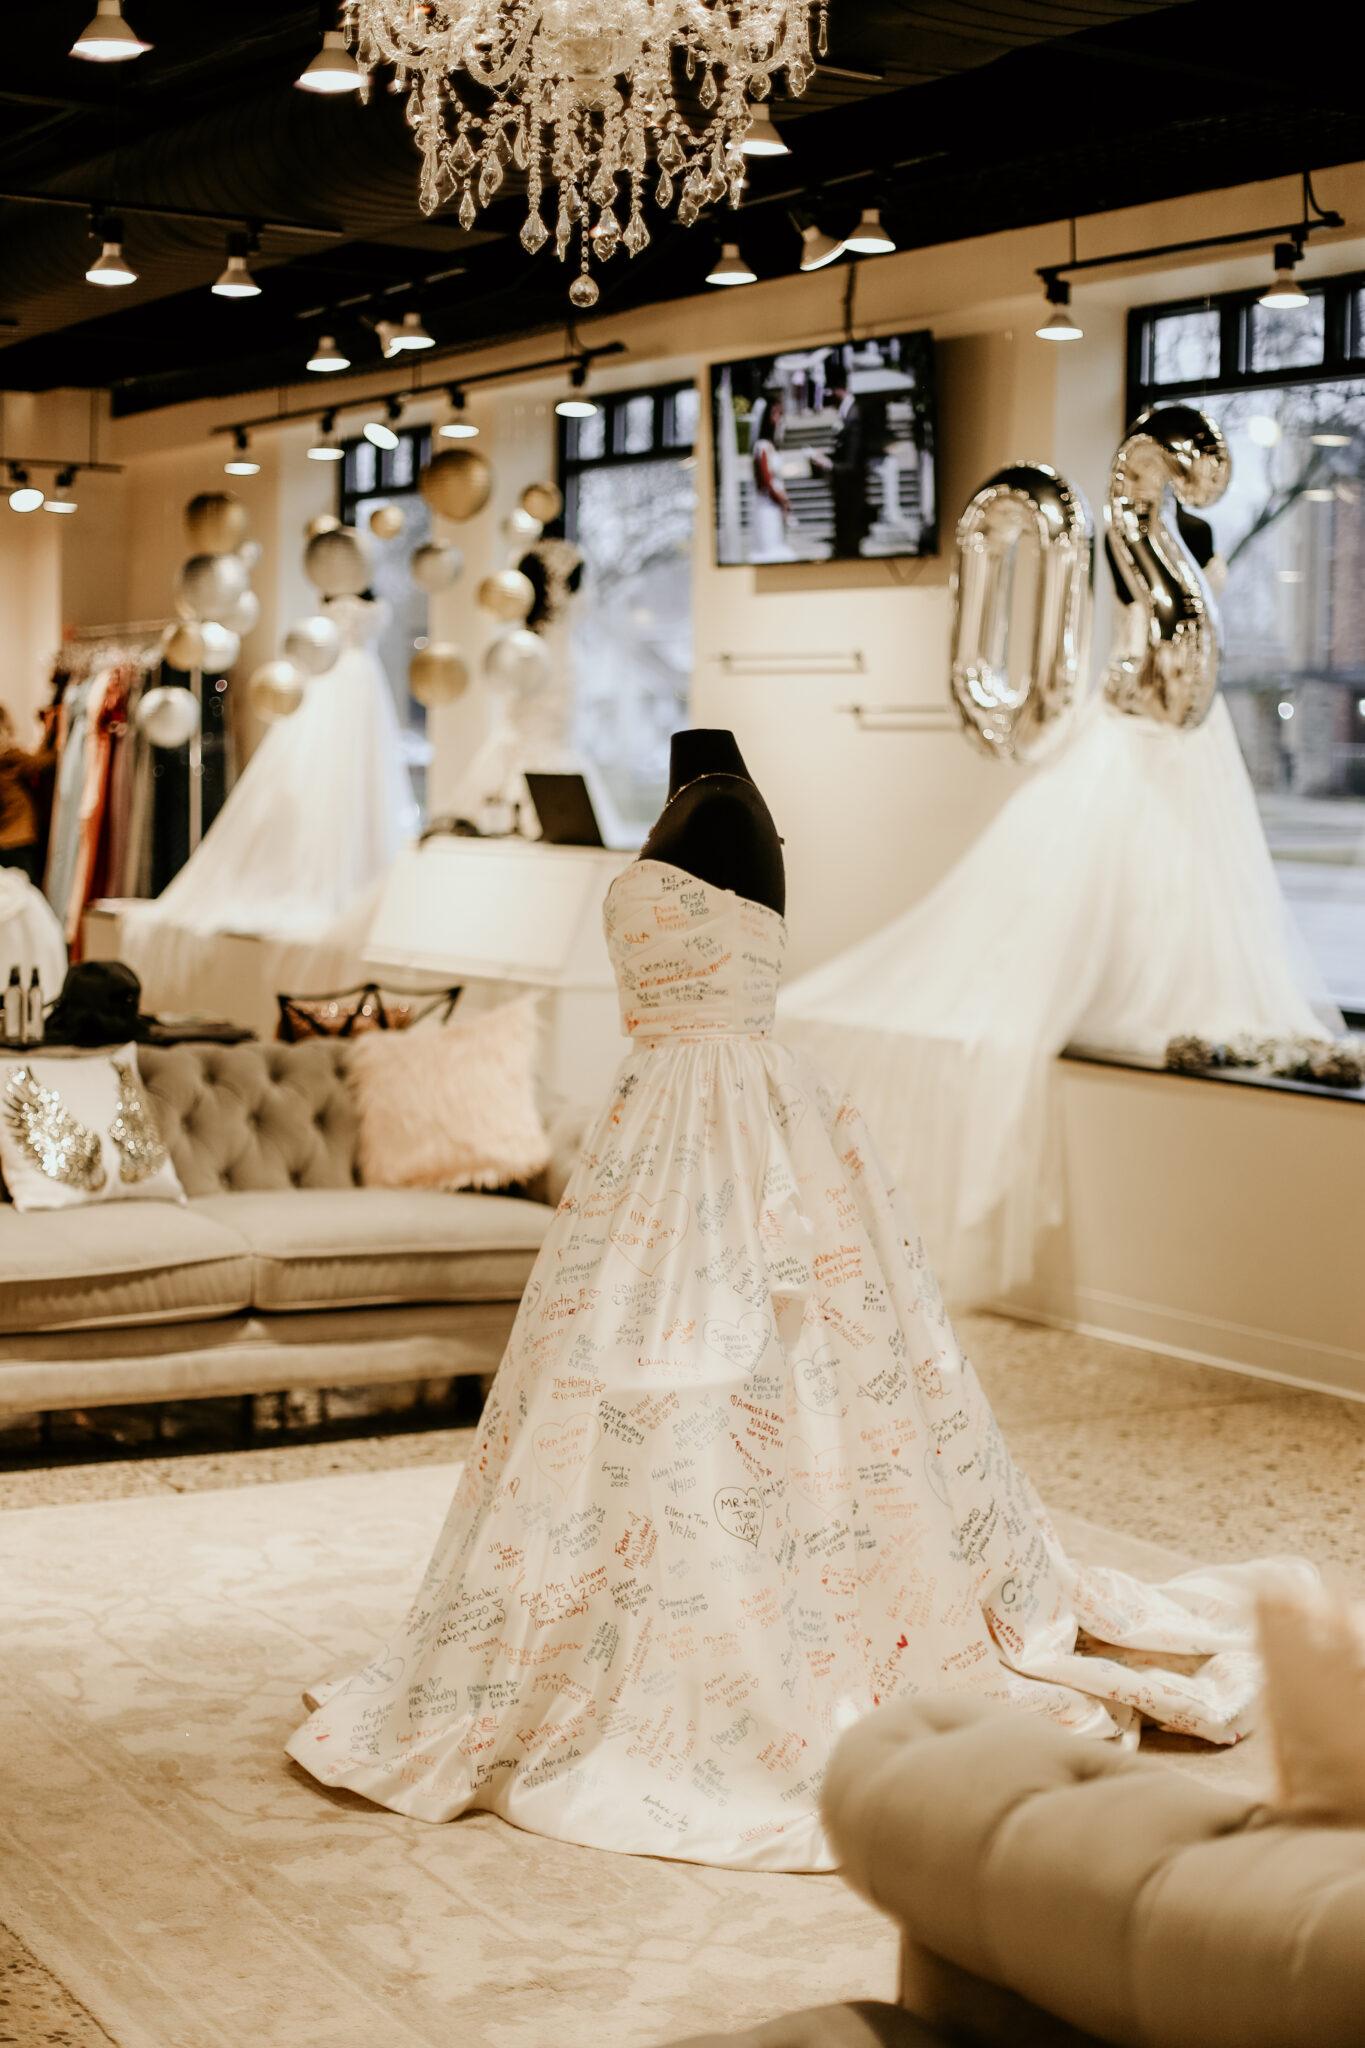 Home The Wedding Shoppe,Formal Dress For Winter Wedding